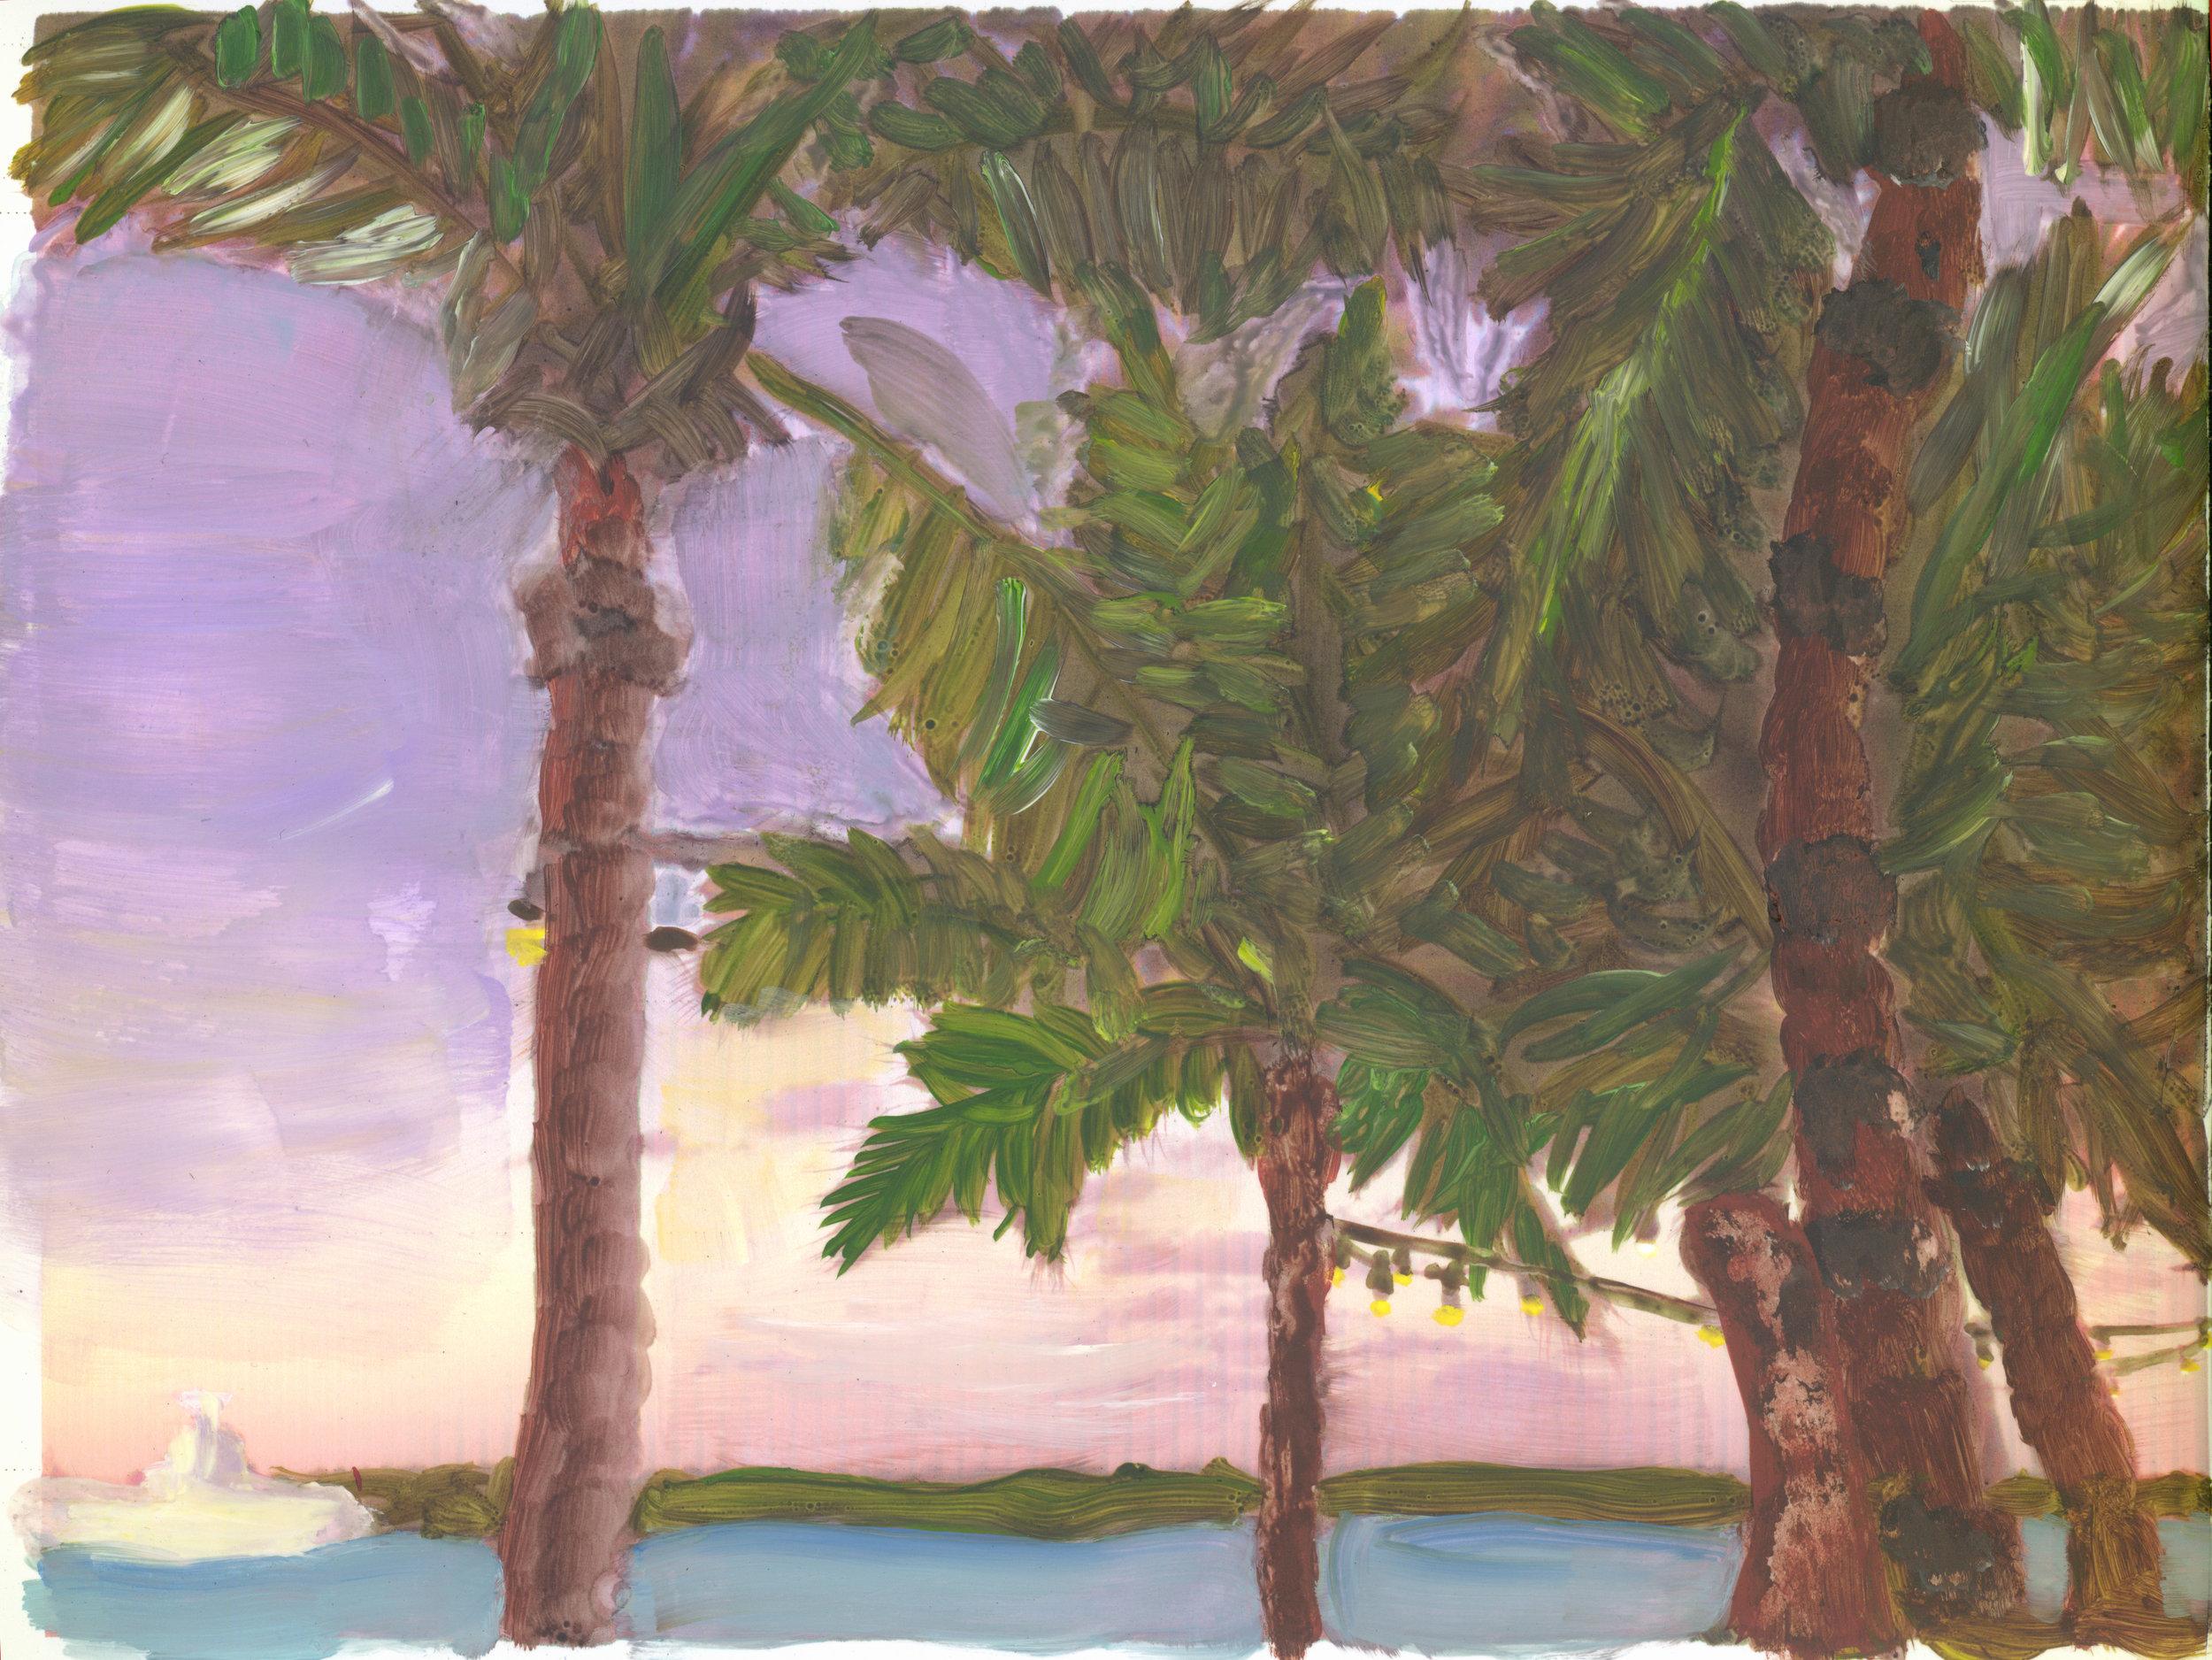 Sunset in Turks in Caicos